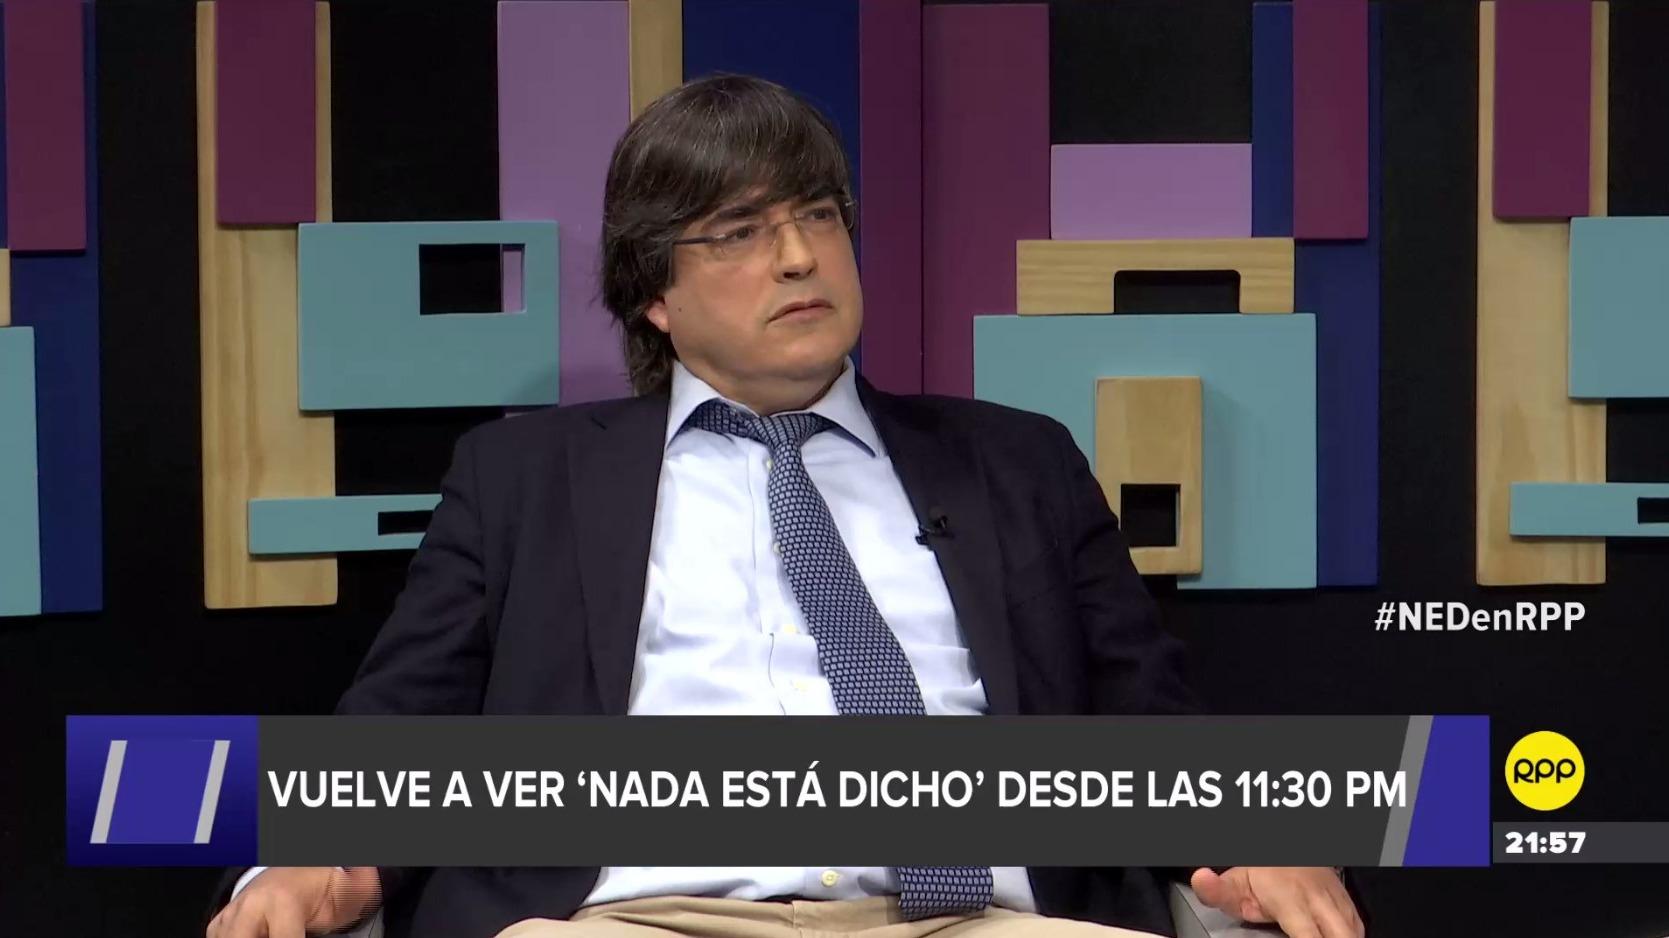 Jaime Bayly partició en segmento de pregunta-respuesta en 'Nada Está Dicho' en RPP.